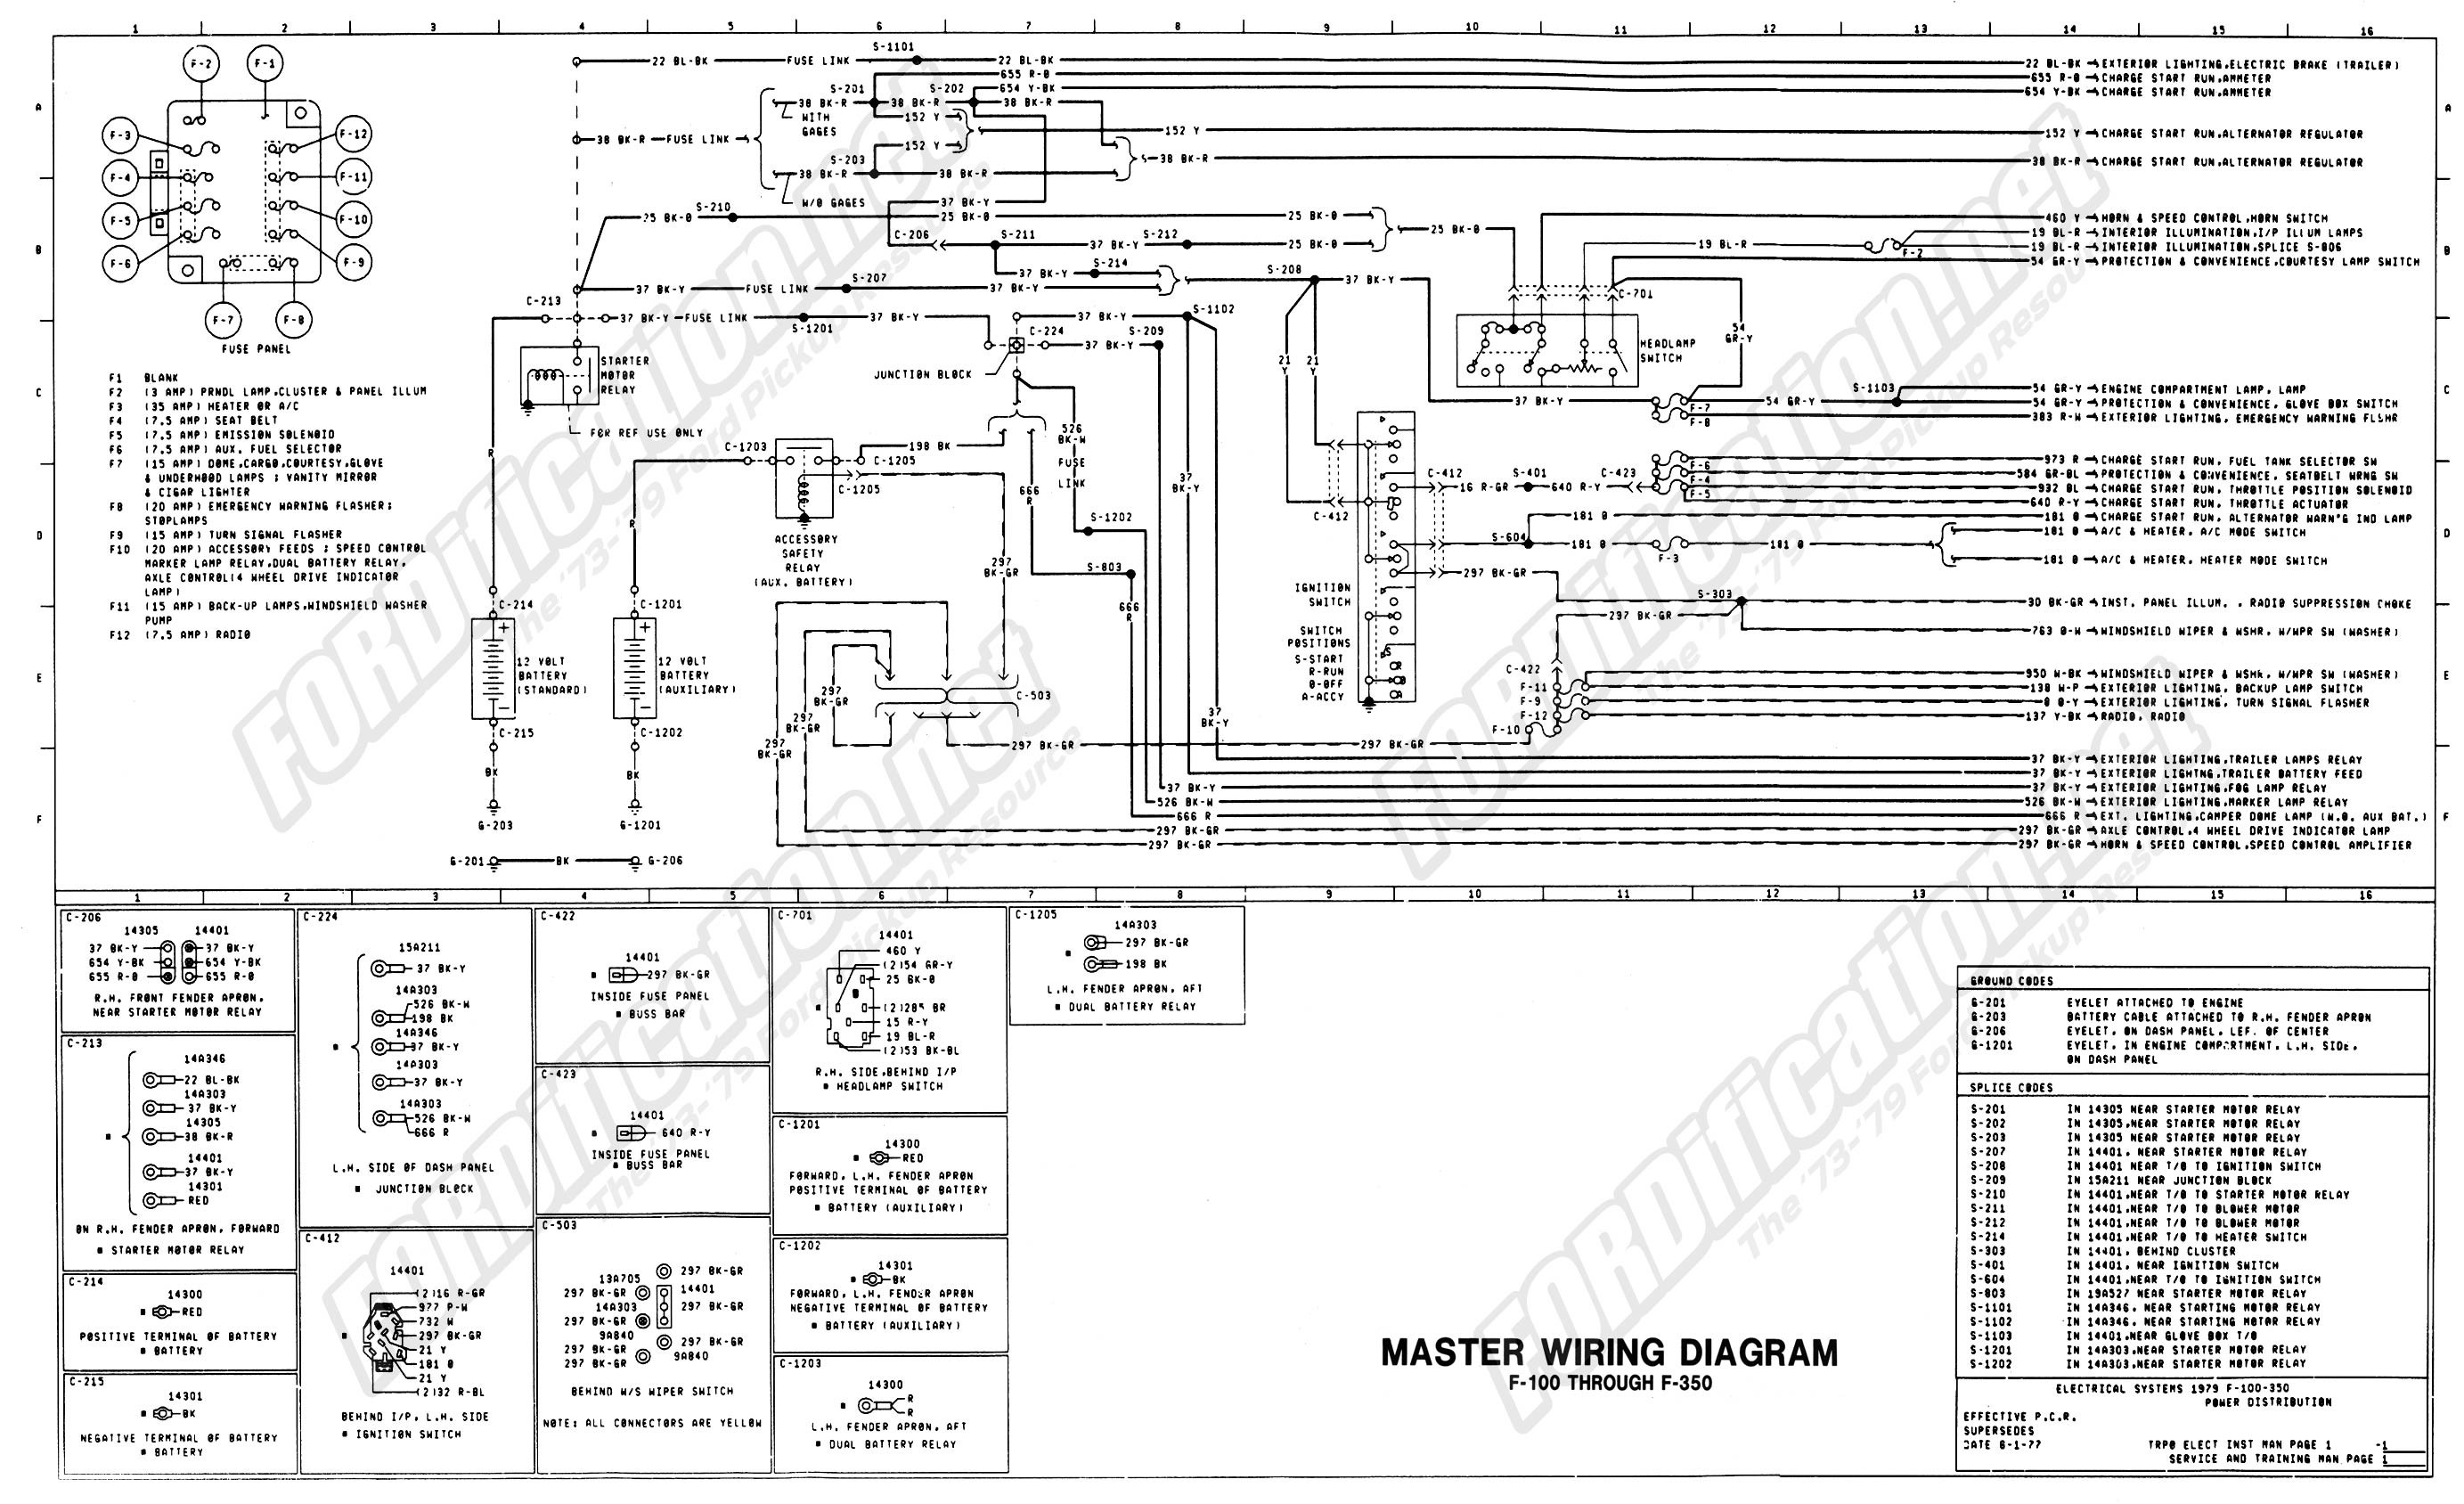 1999 ford F250 Brake Lights Wiring Diagram 1973 1979 ford Truck Wiring Diagrams & Schematics Of 1999 ford F250 Brake Lights Wiring Diagram